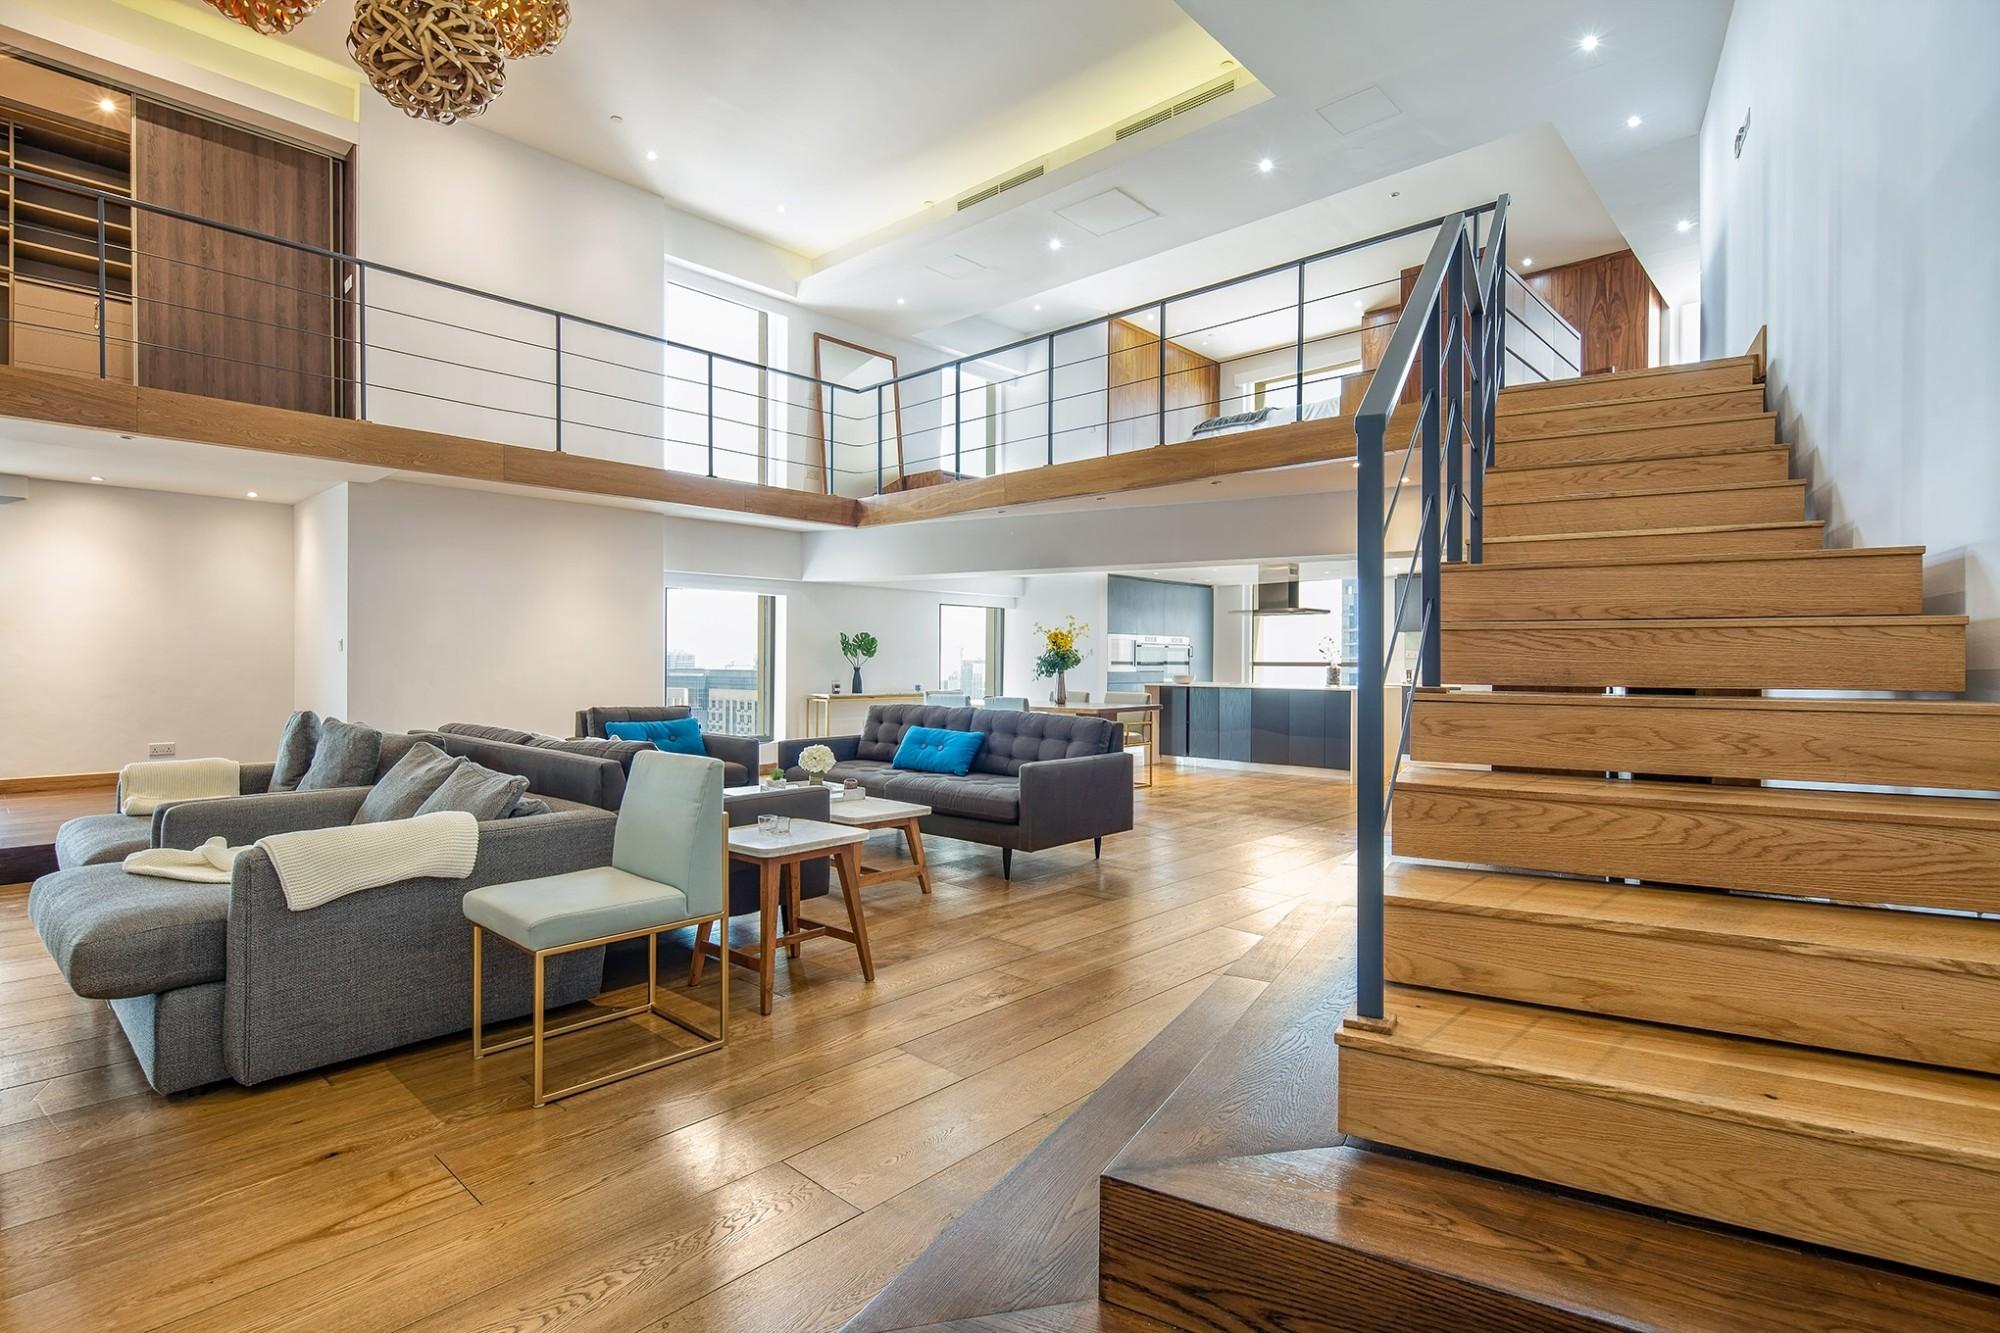 Exclusive designer loft apartment by the beach